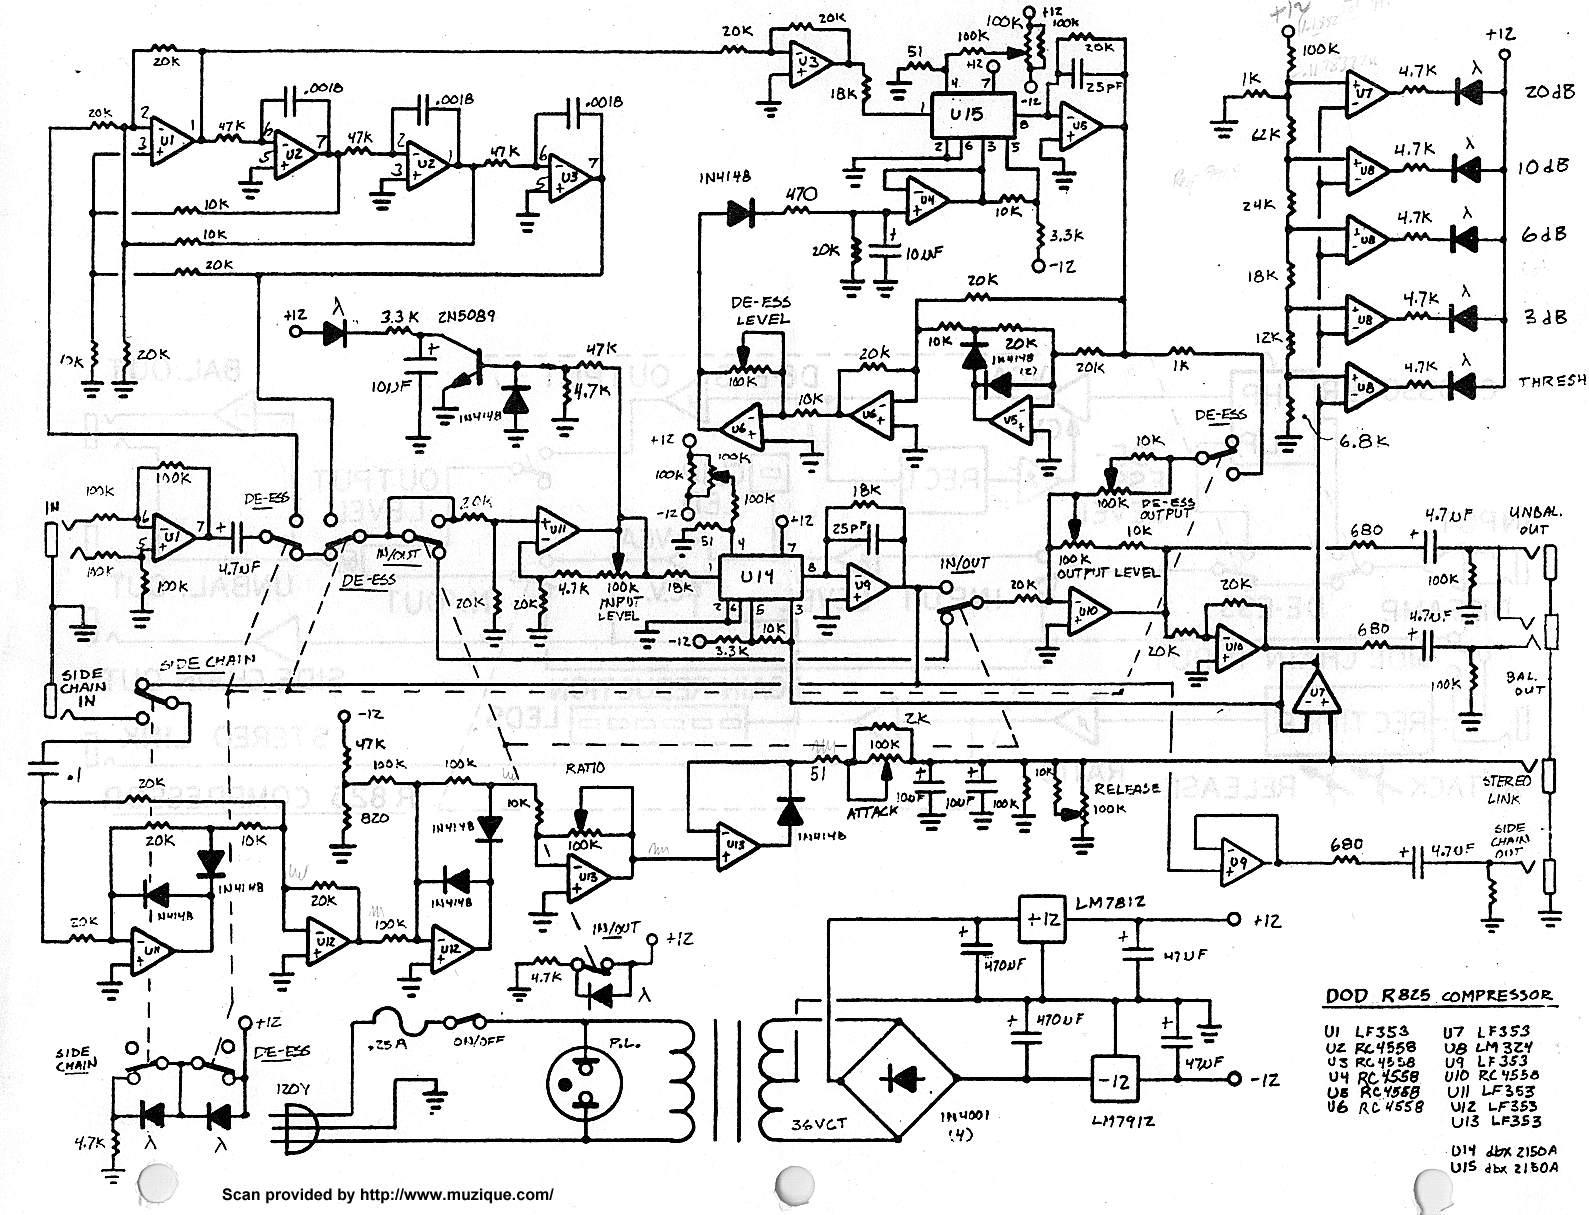 Index Of Diy Schematics Compressors Gates And Limiters